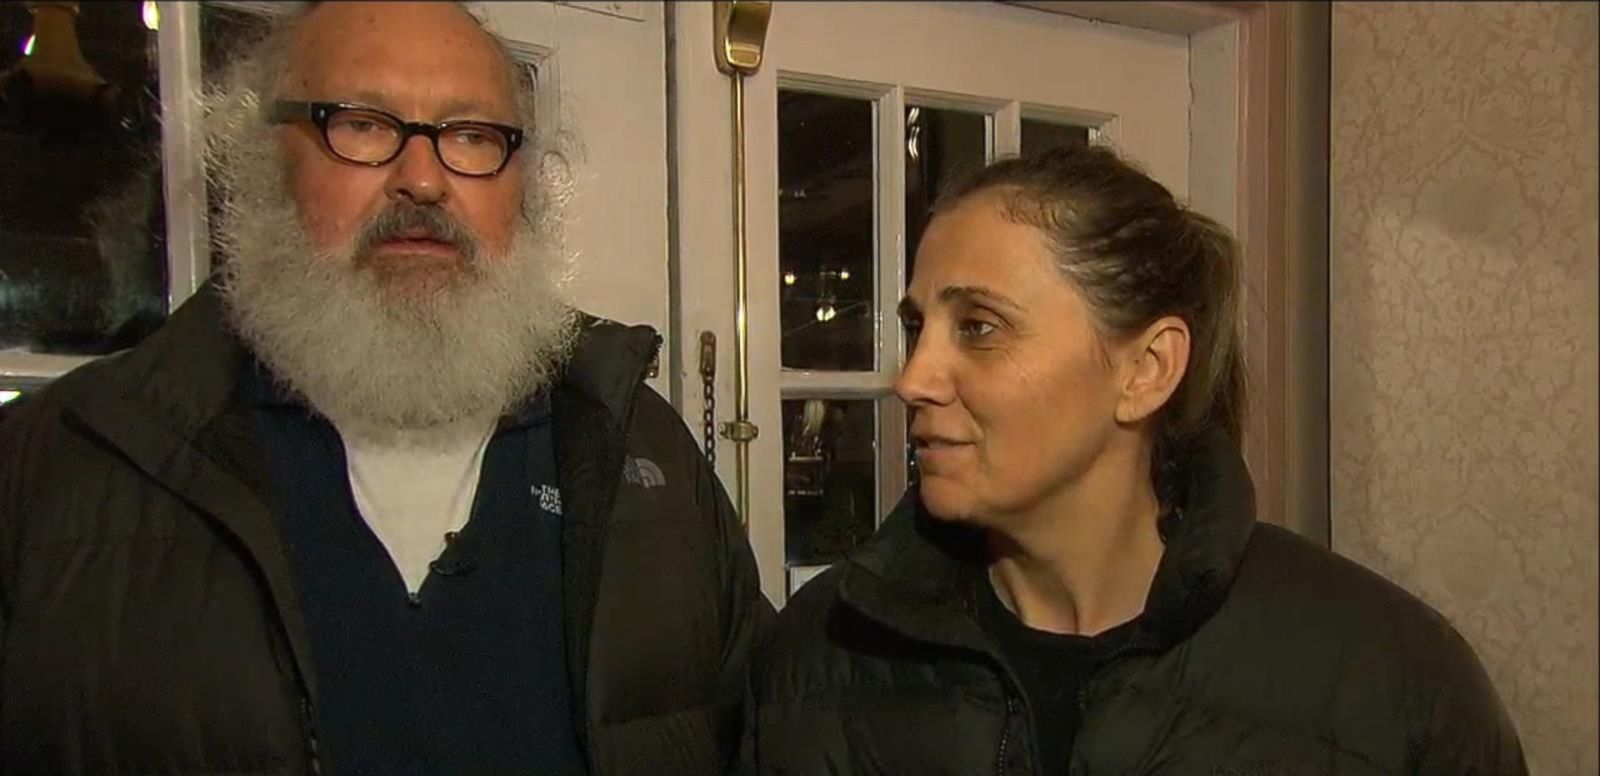 VIDEO: Exclusive: Randy Quaid Speaks Out About Arrest